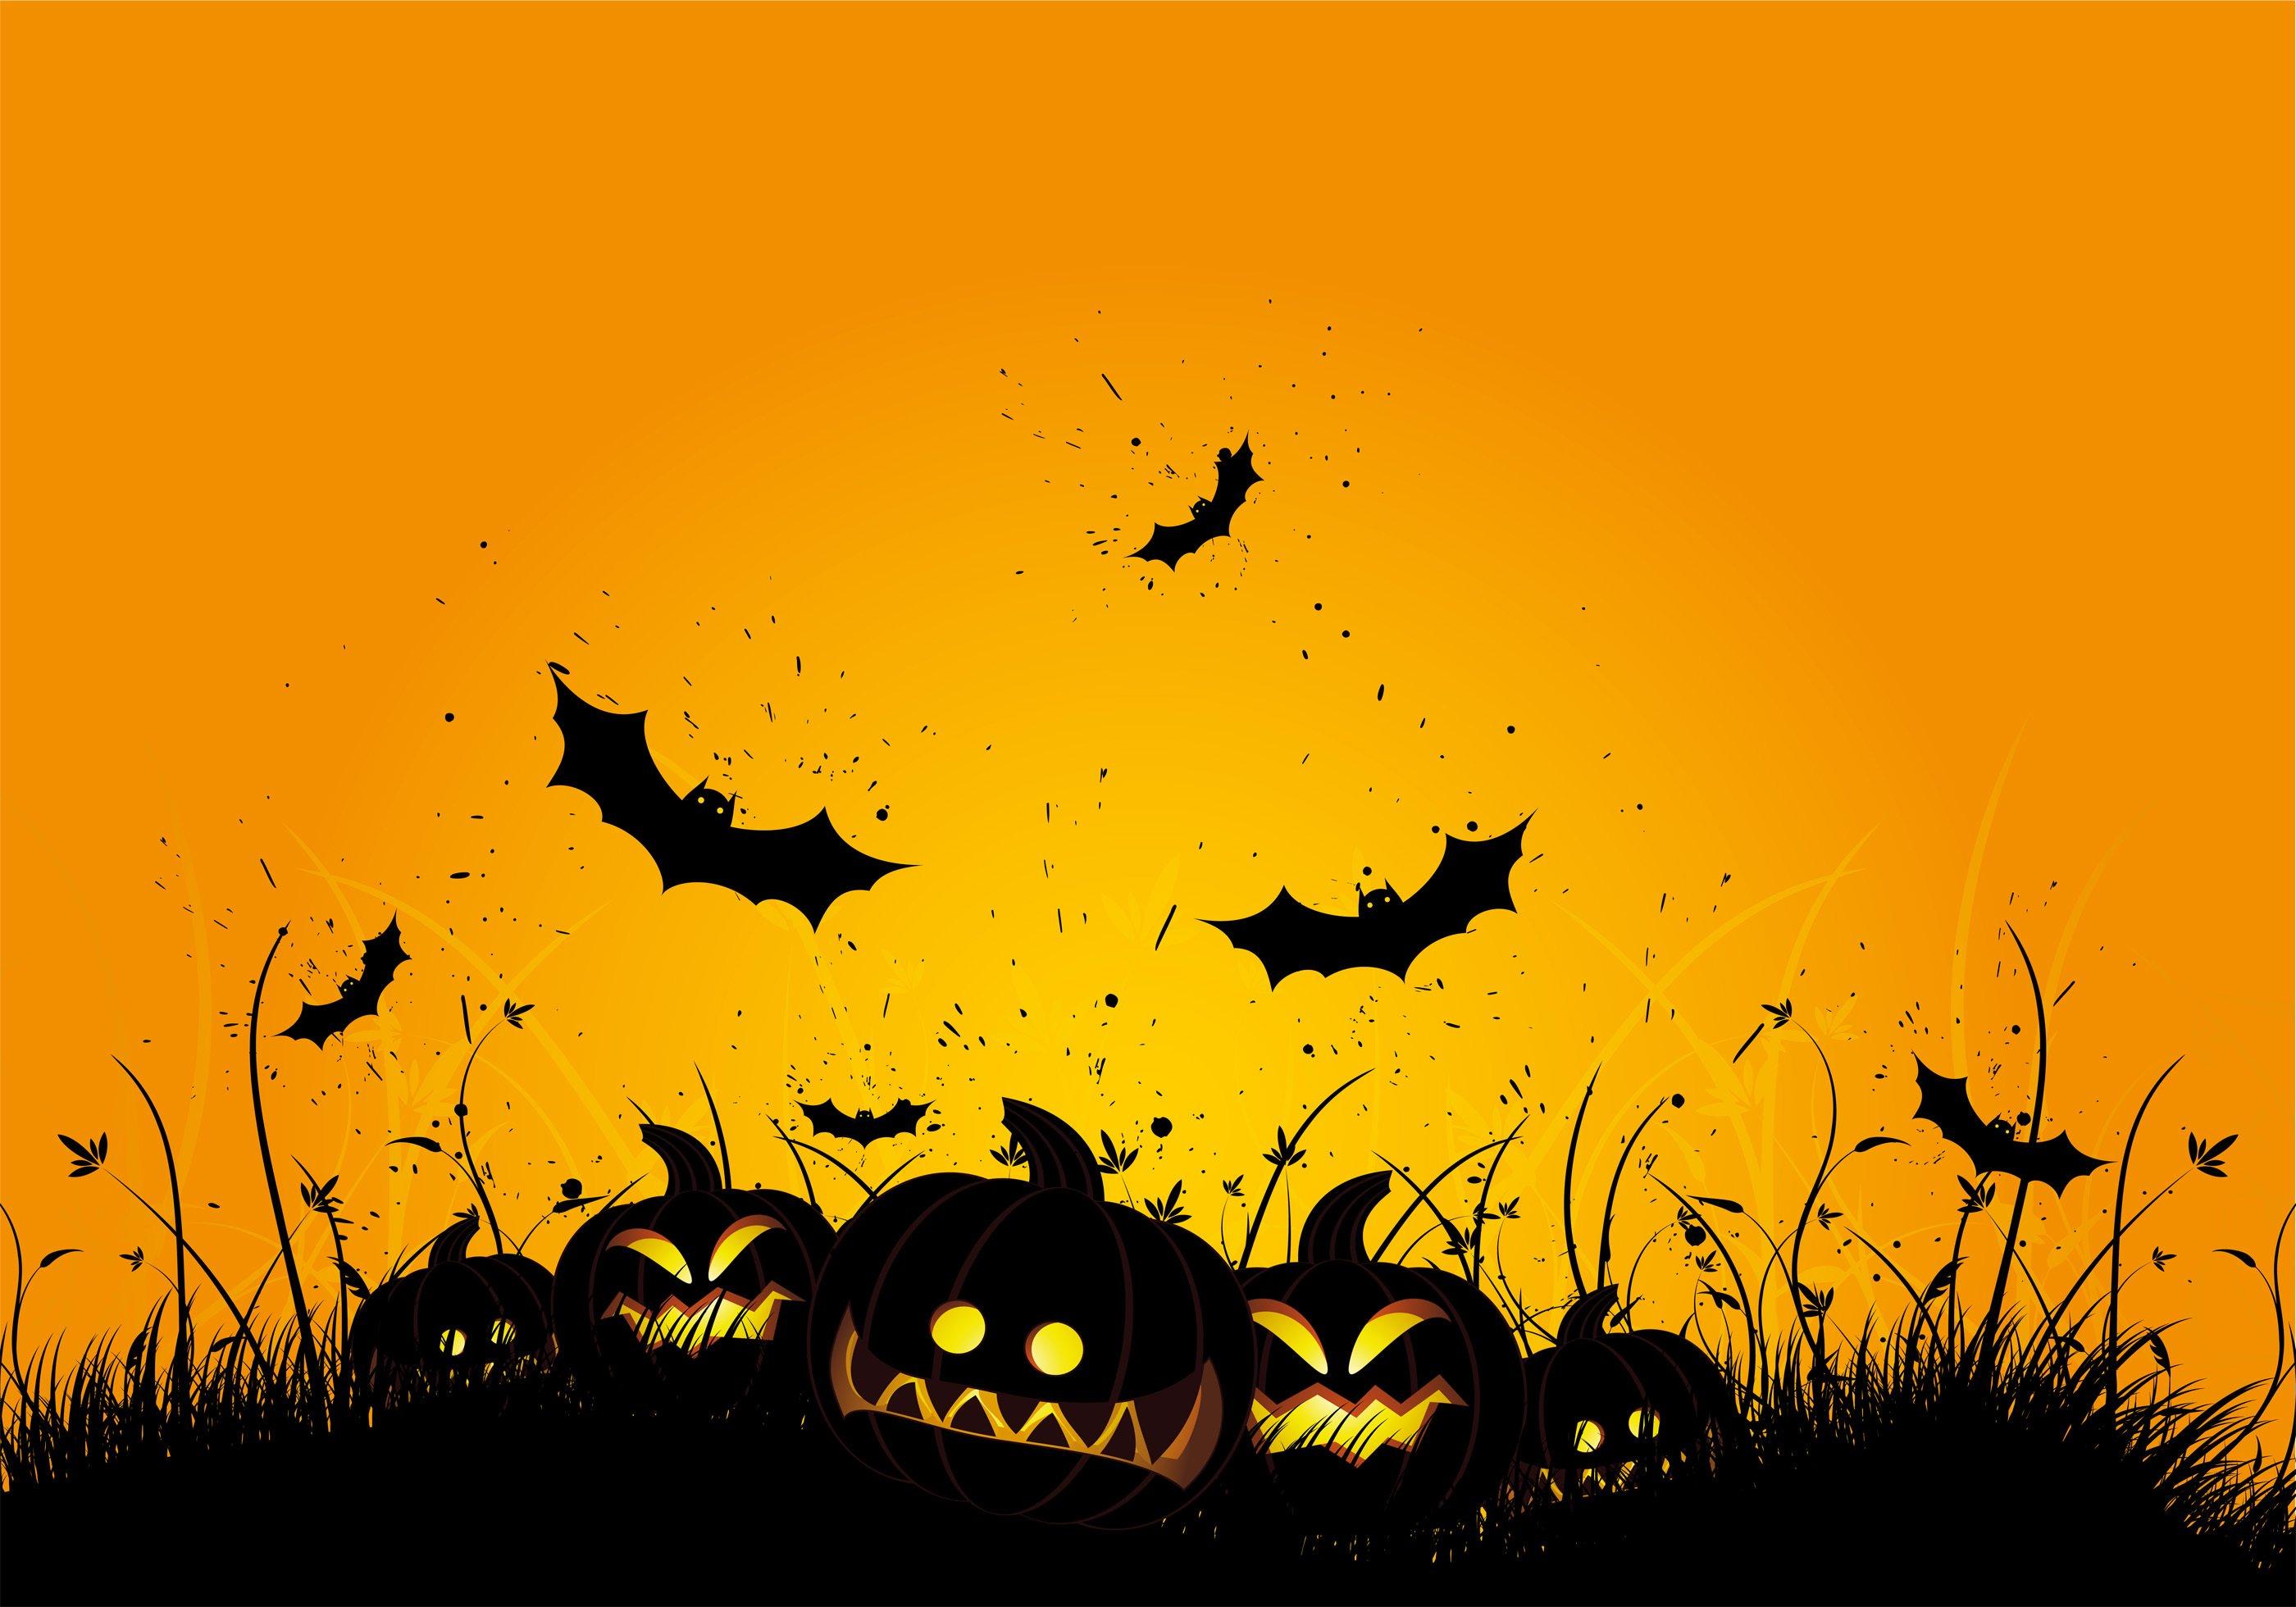 Backdrop Halloween Bat  3m x 2.3m $60 Incl frame & gst